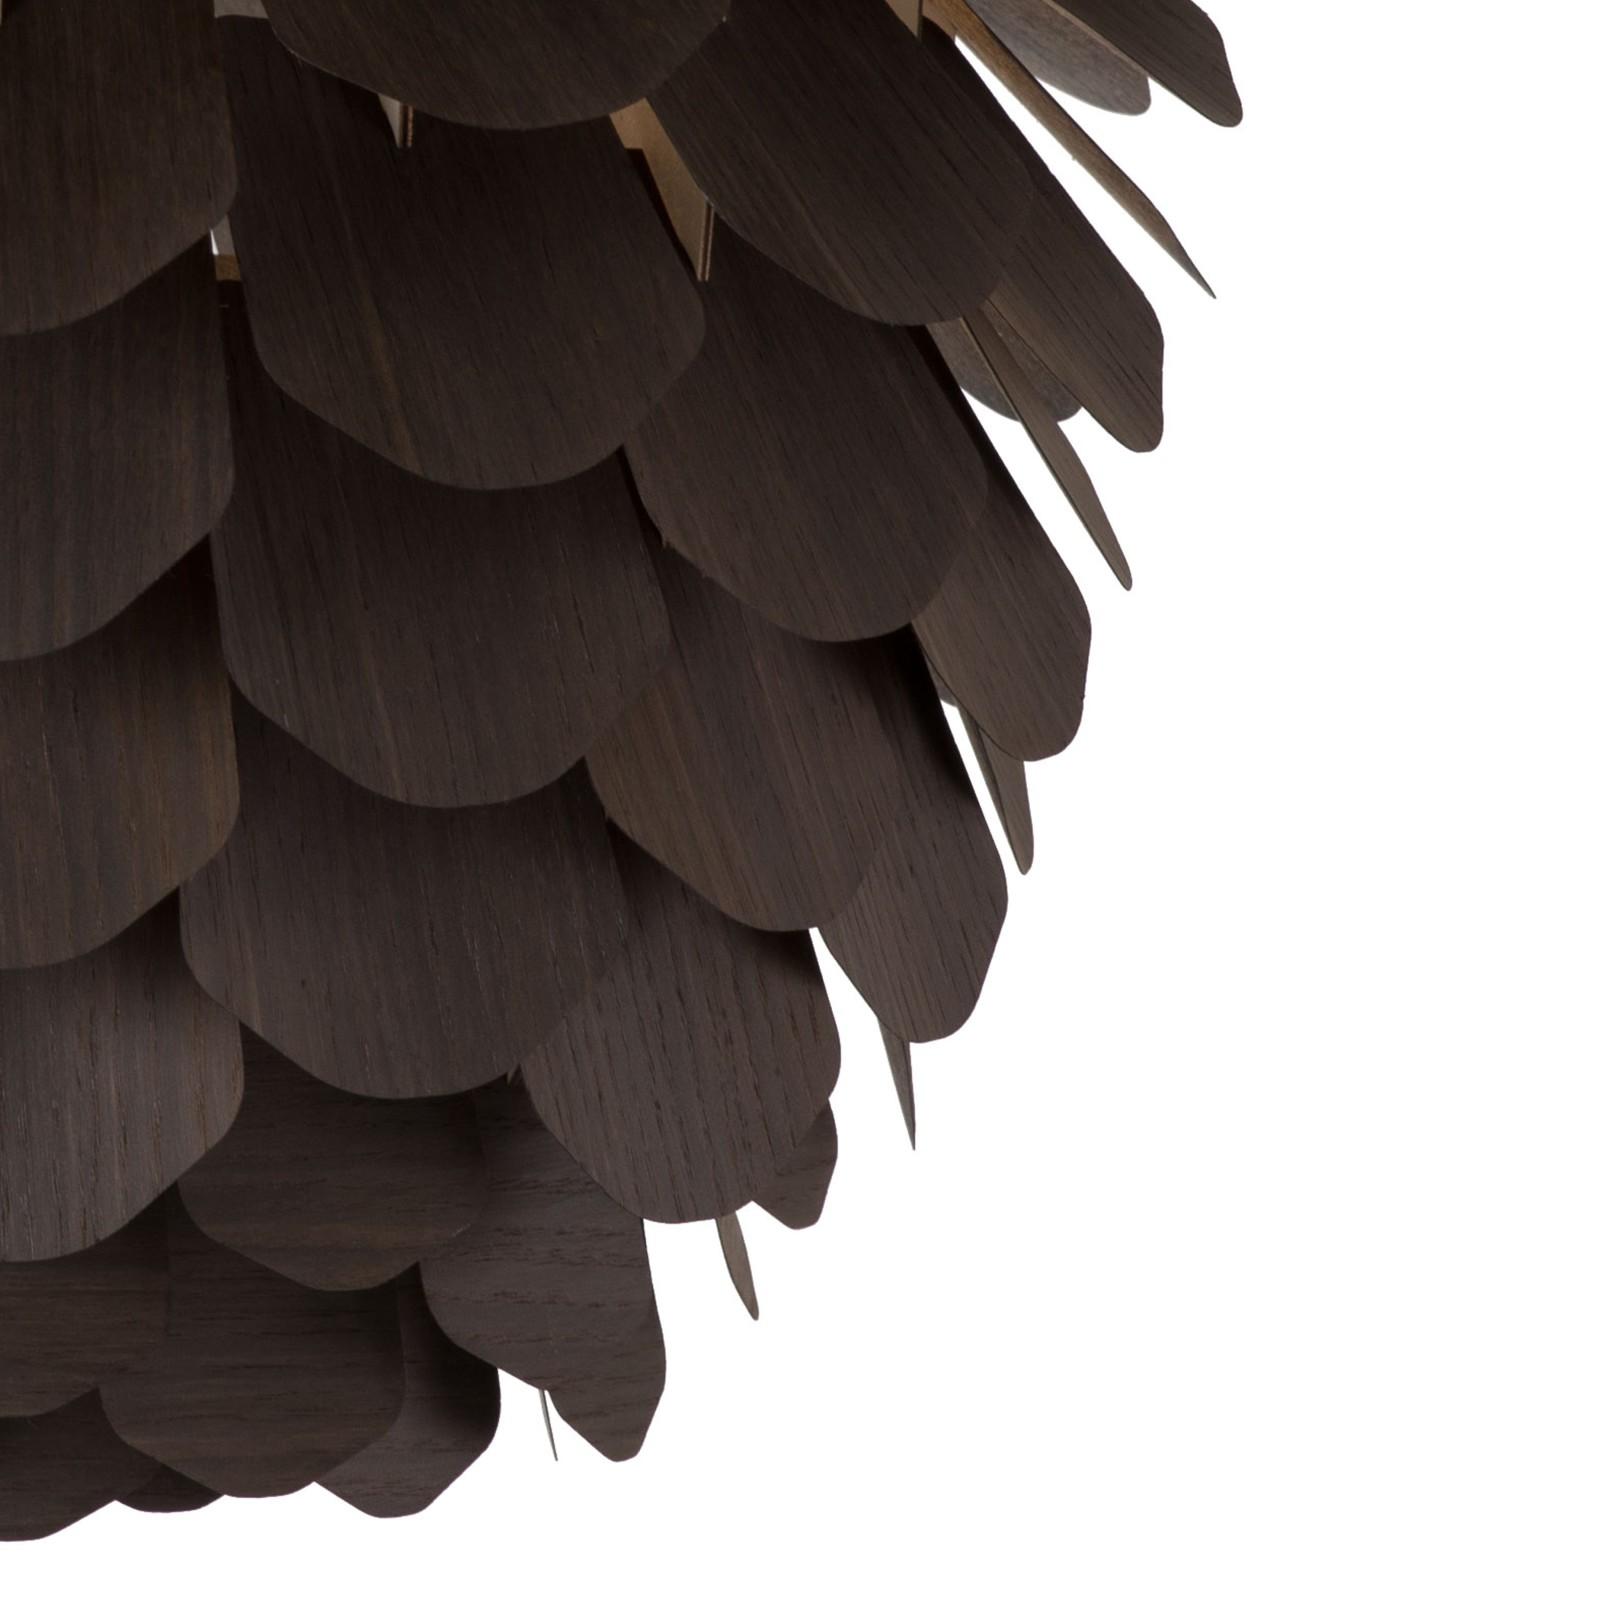 Zappy 'Big Pine' Pendant light Smoked Oak